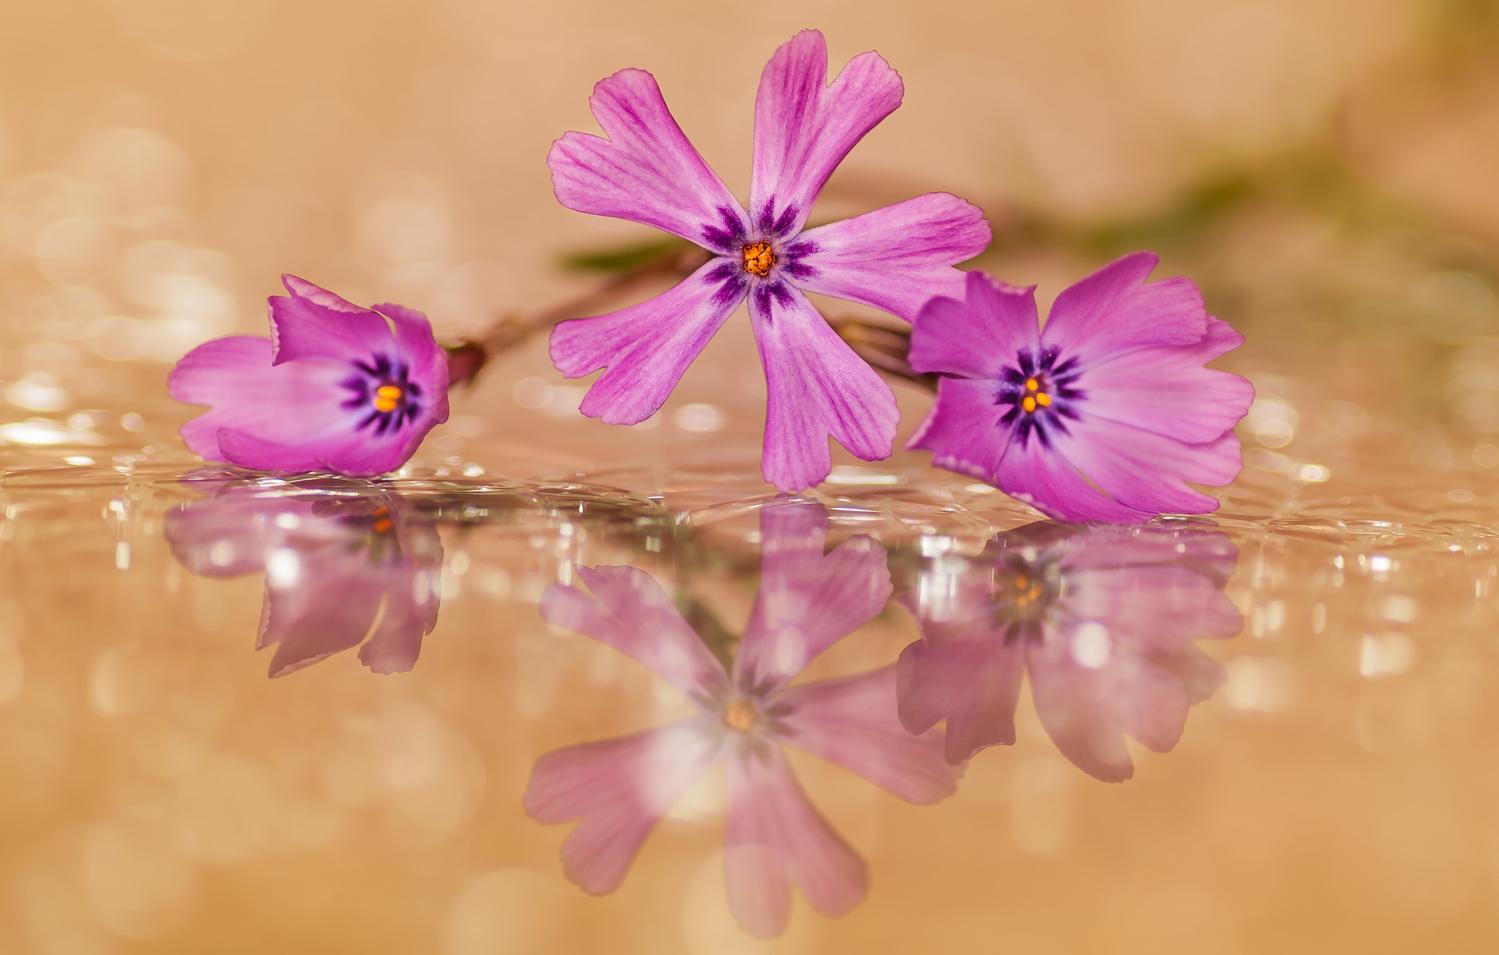 Reflections by Atul Saluja